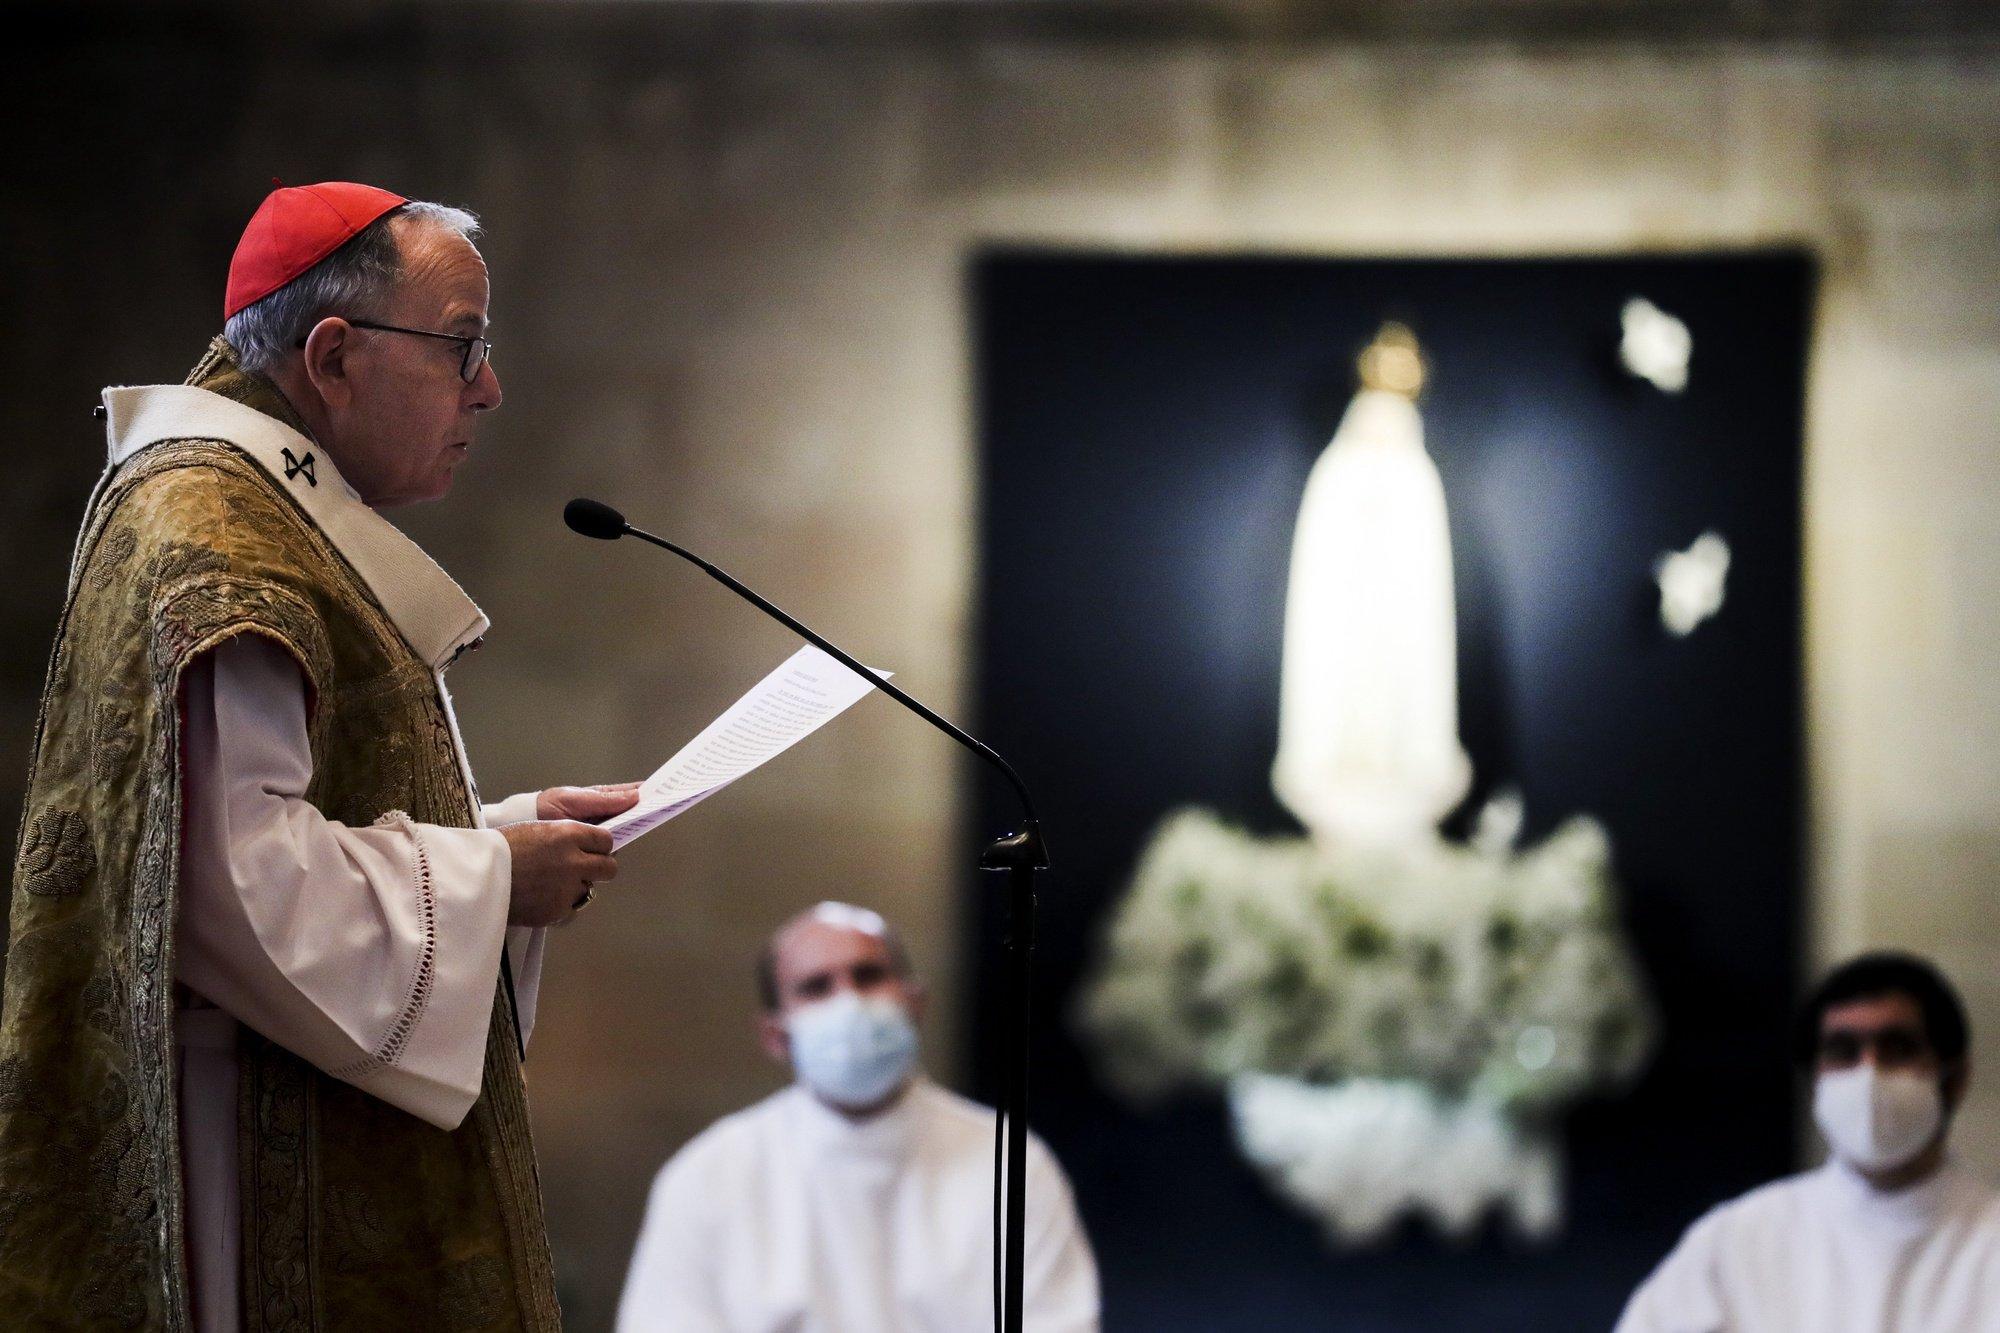 O Cardeal patriarca de Lisboa, Manuel Clemente, presidiu à missa do Dia de Natal na Sé Patriarcal de Lisboa, 25 de dezembro de 2020. TIAGO PETINGA/LUSA